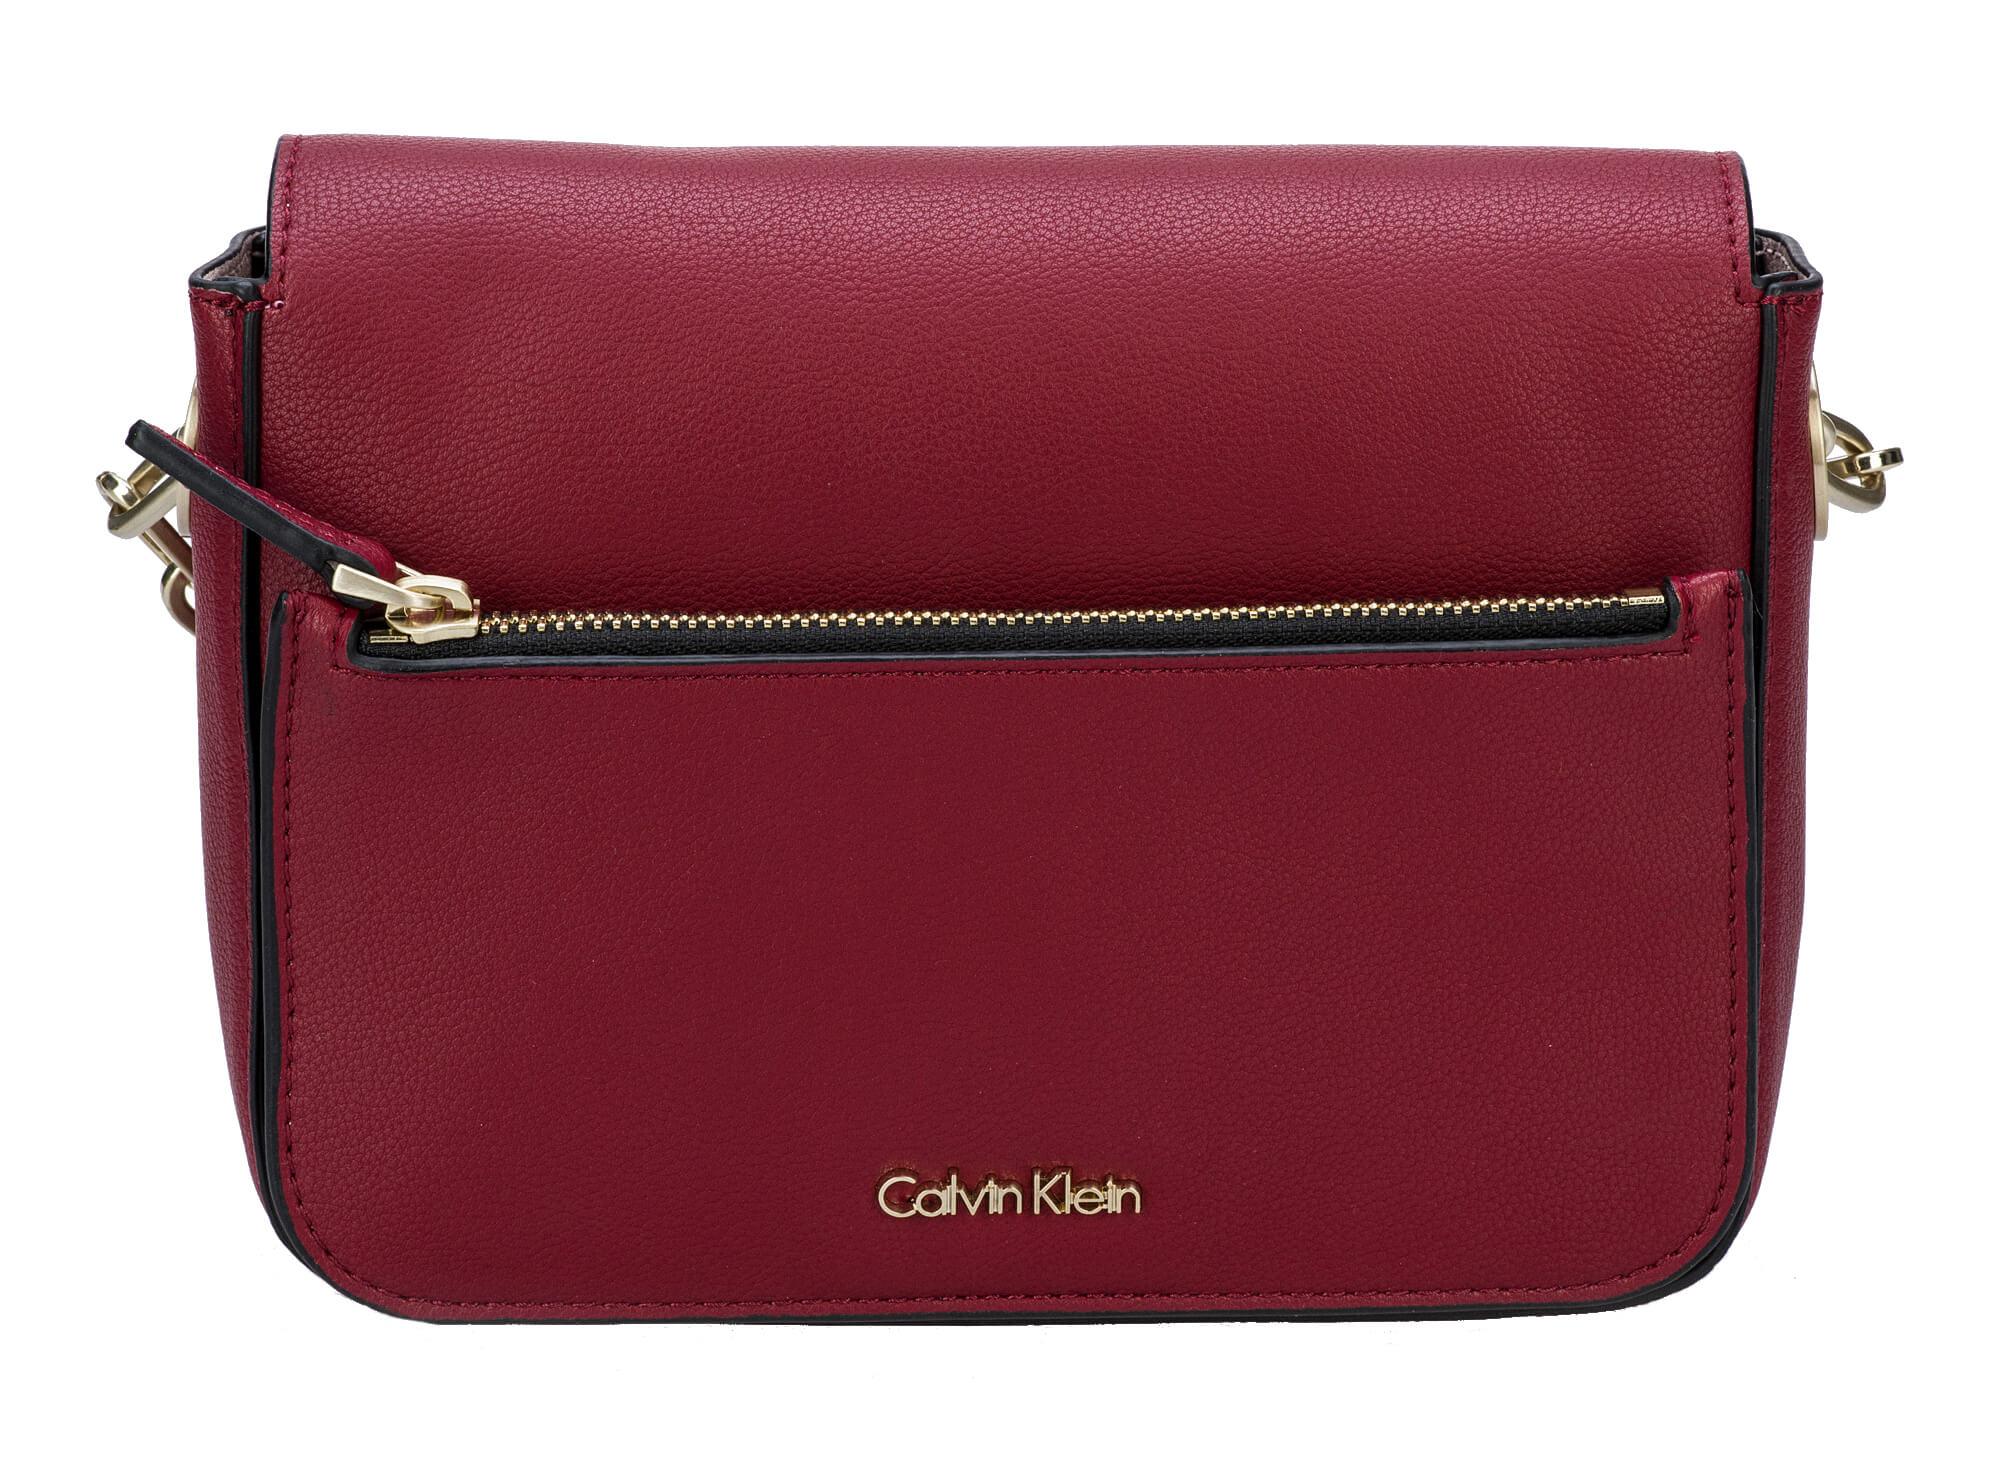 Calvin Klein Dámska kabelka Night Out Small Shoulder Bag Red Dahlia ... 64793fcc80f